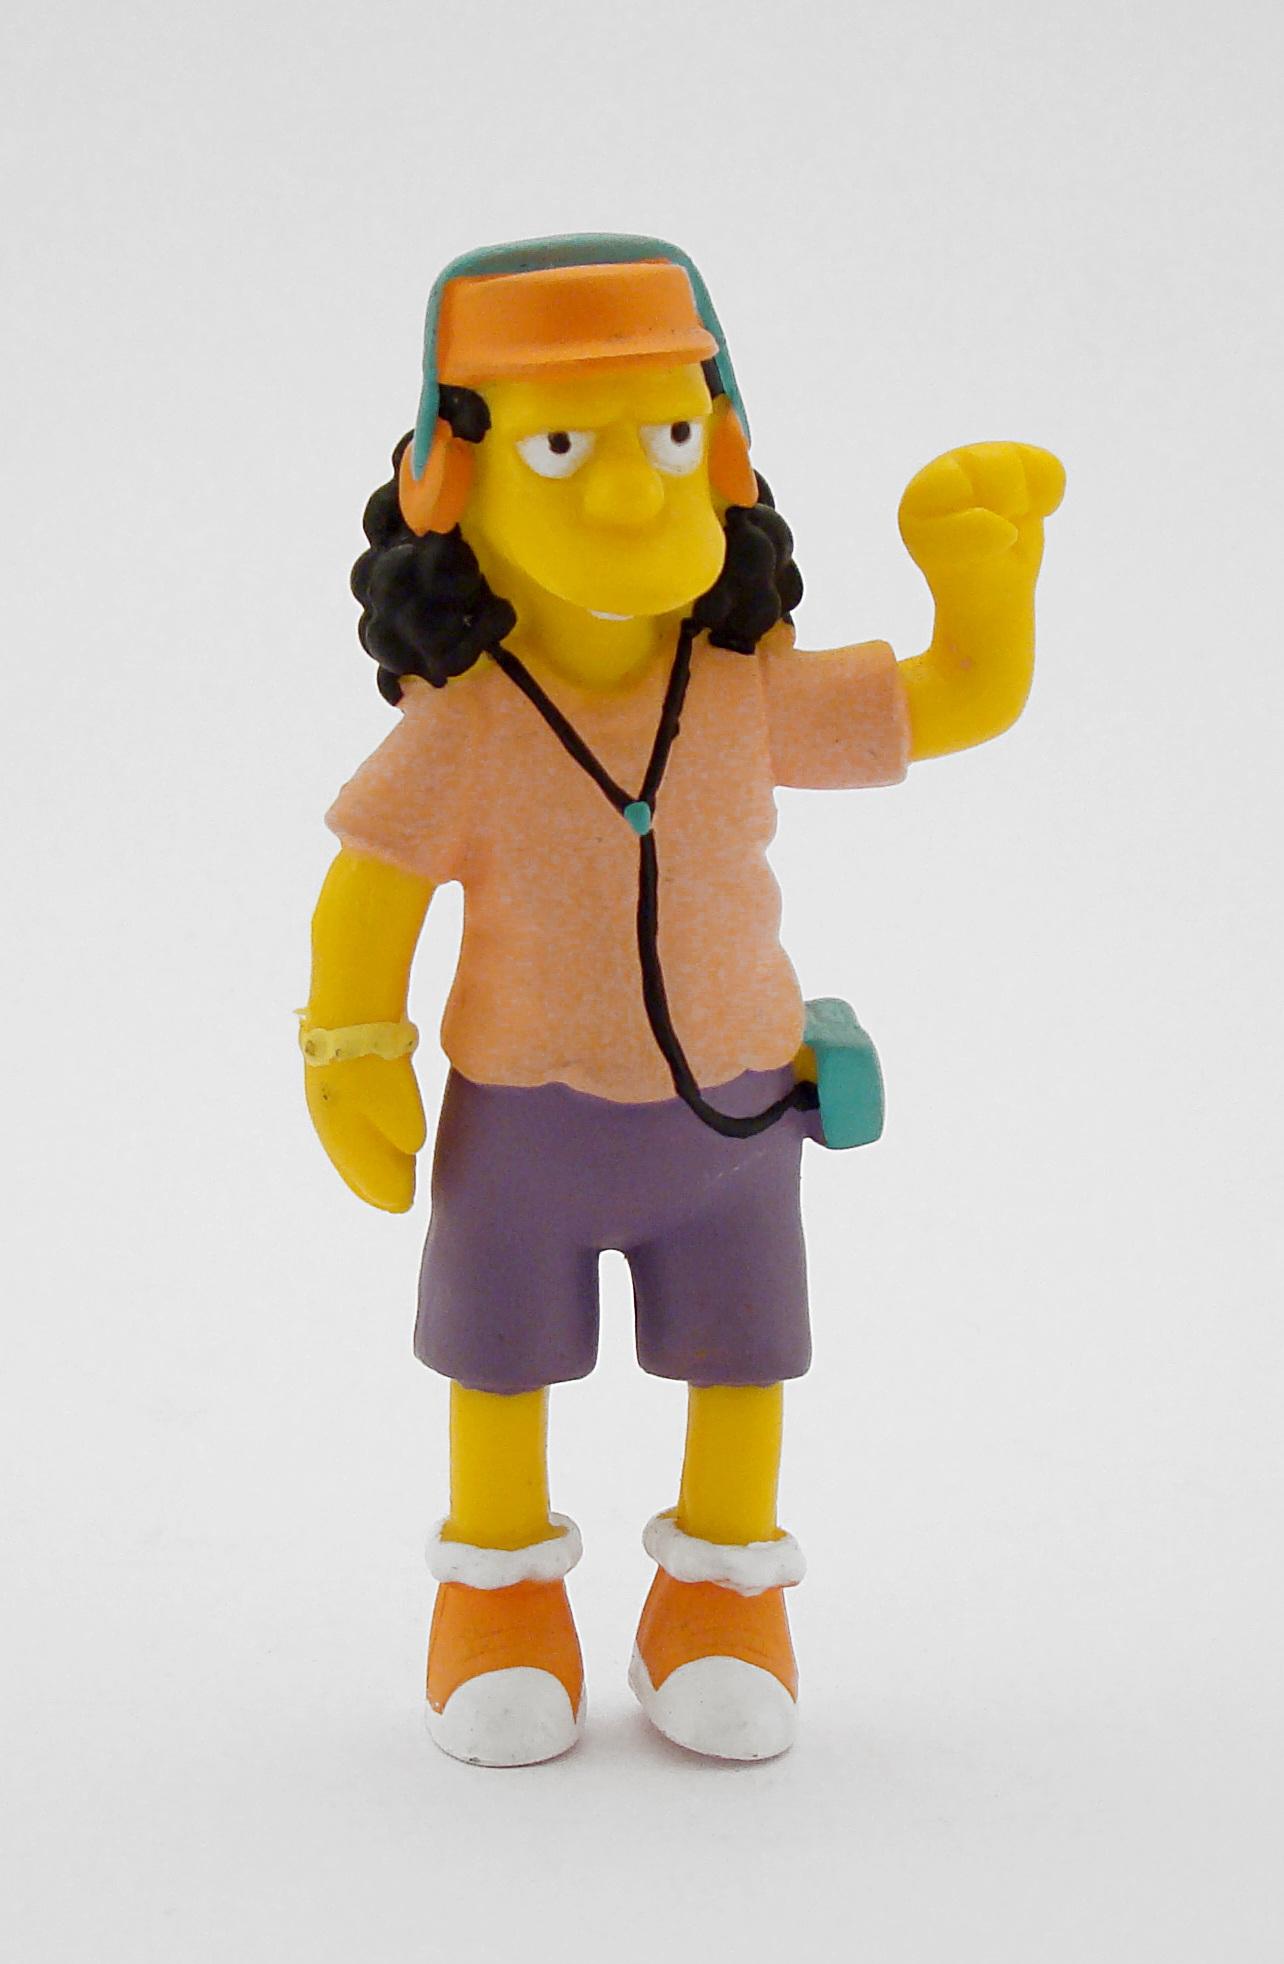 Gambar Retro Kuning Mainan Produk Arca Orang Orangan Salju